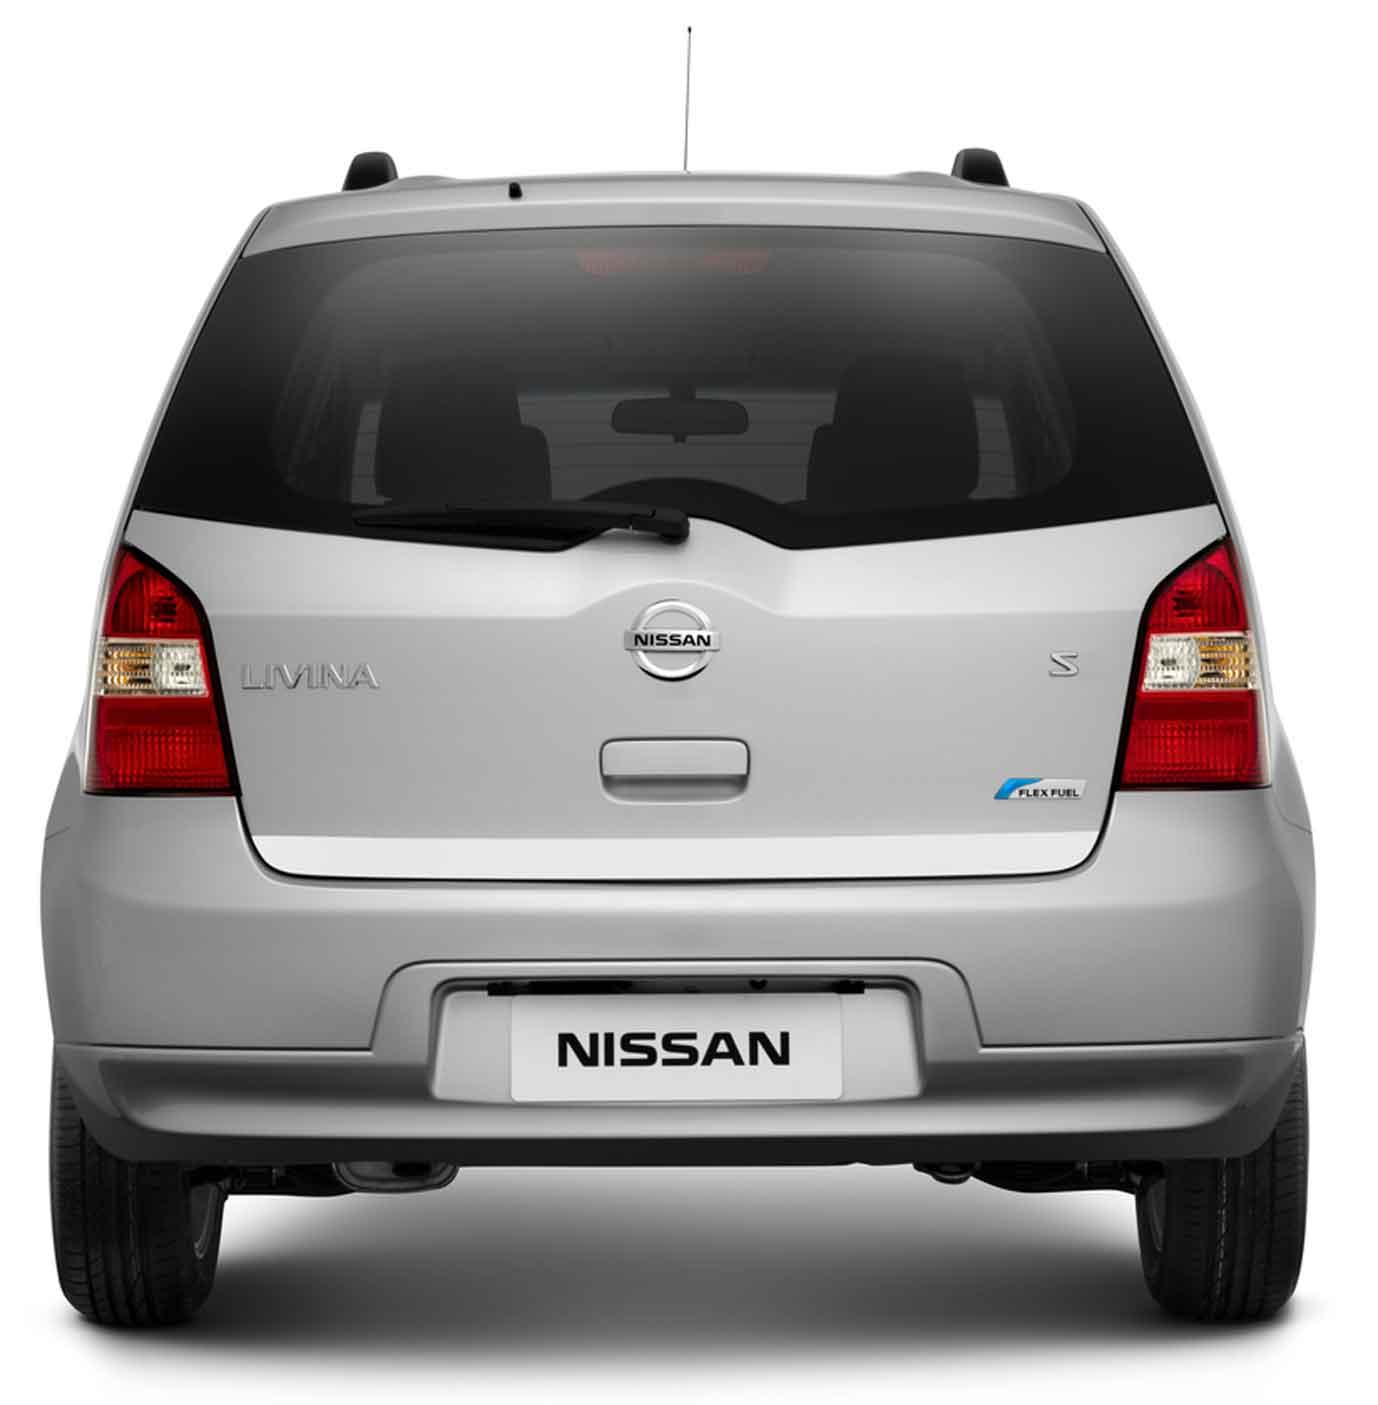 novo Nissan Livina 2014 porta malas